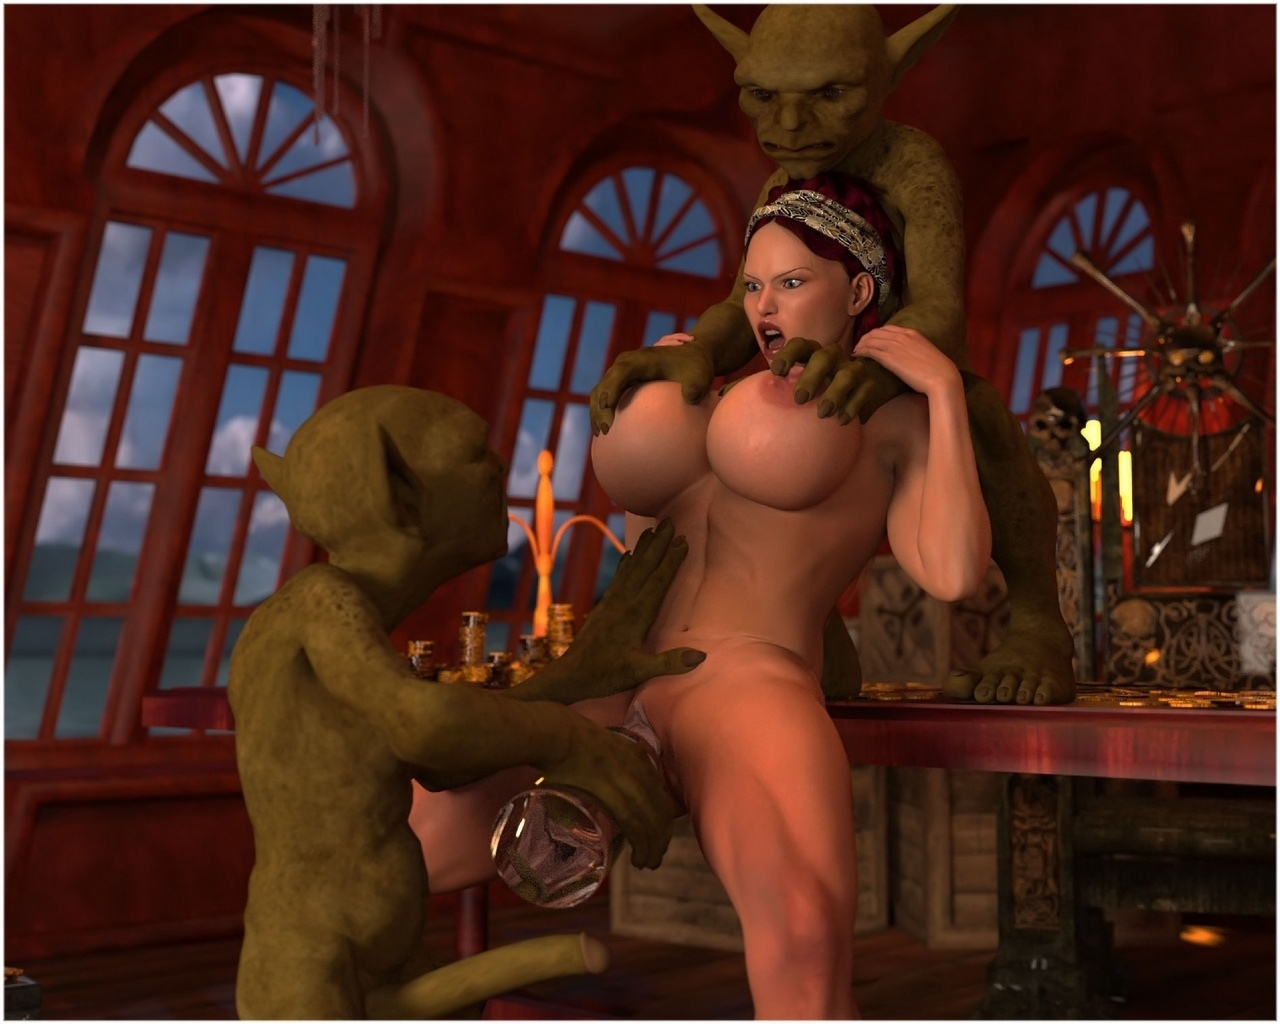 лешего секс картинки